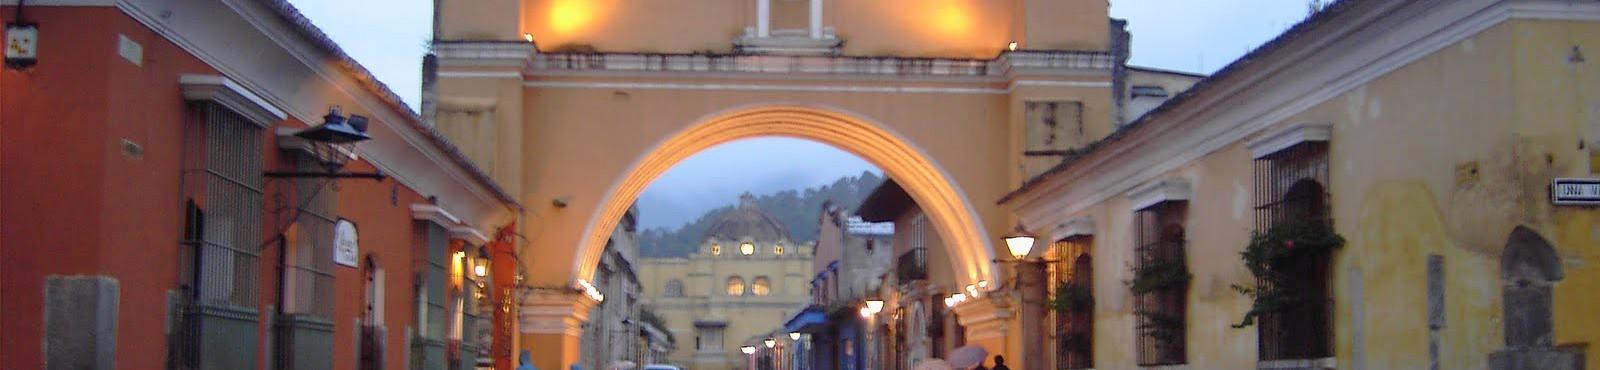 Centroamerica 2004/2005